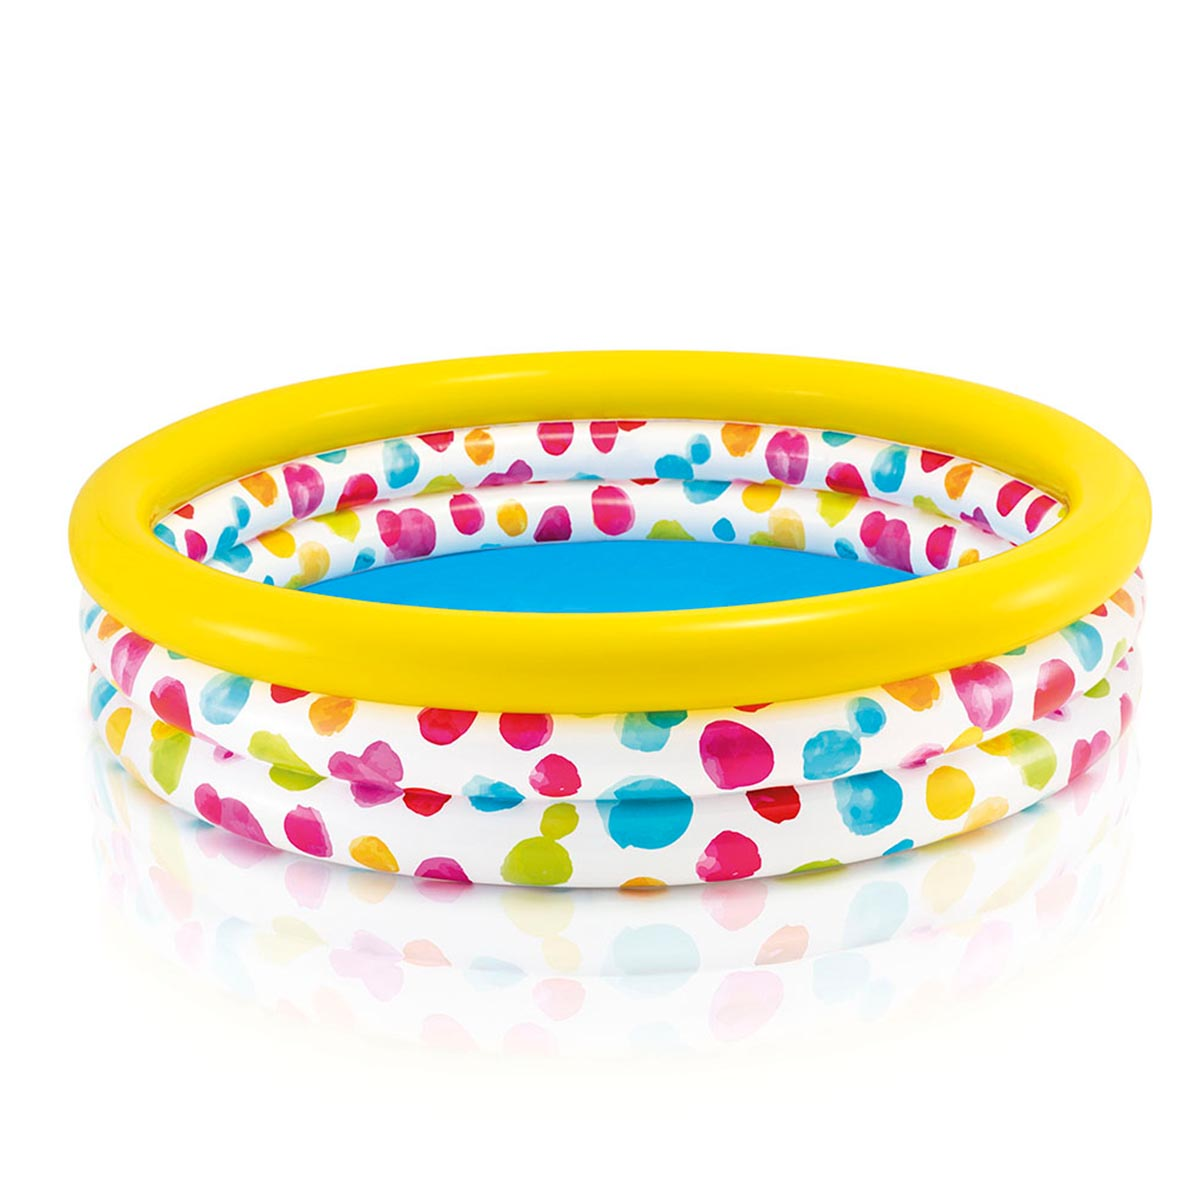 Intex Cool Dots Pool kinderzwembad 168 x 38 cm